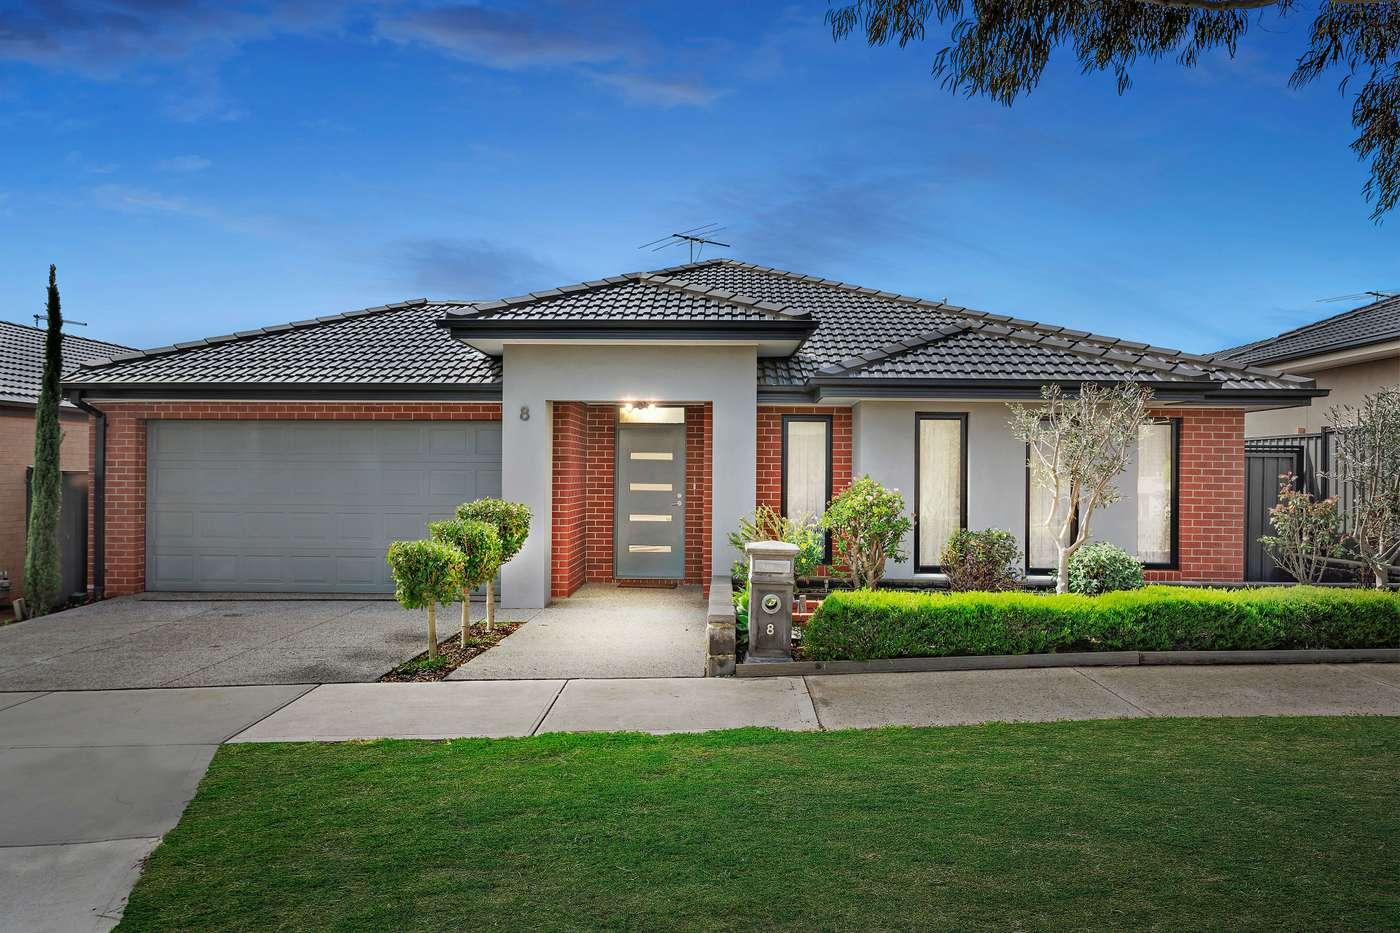 Main view of Homely house listing, 8 Hodgson Rise, Mernda, VIC 3754